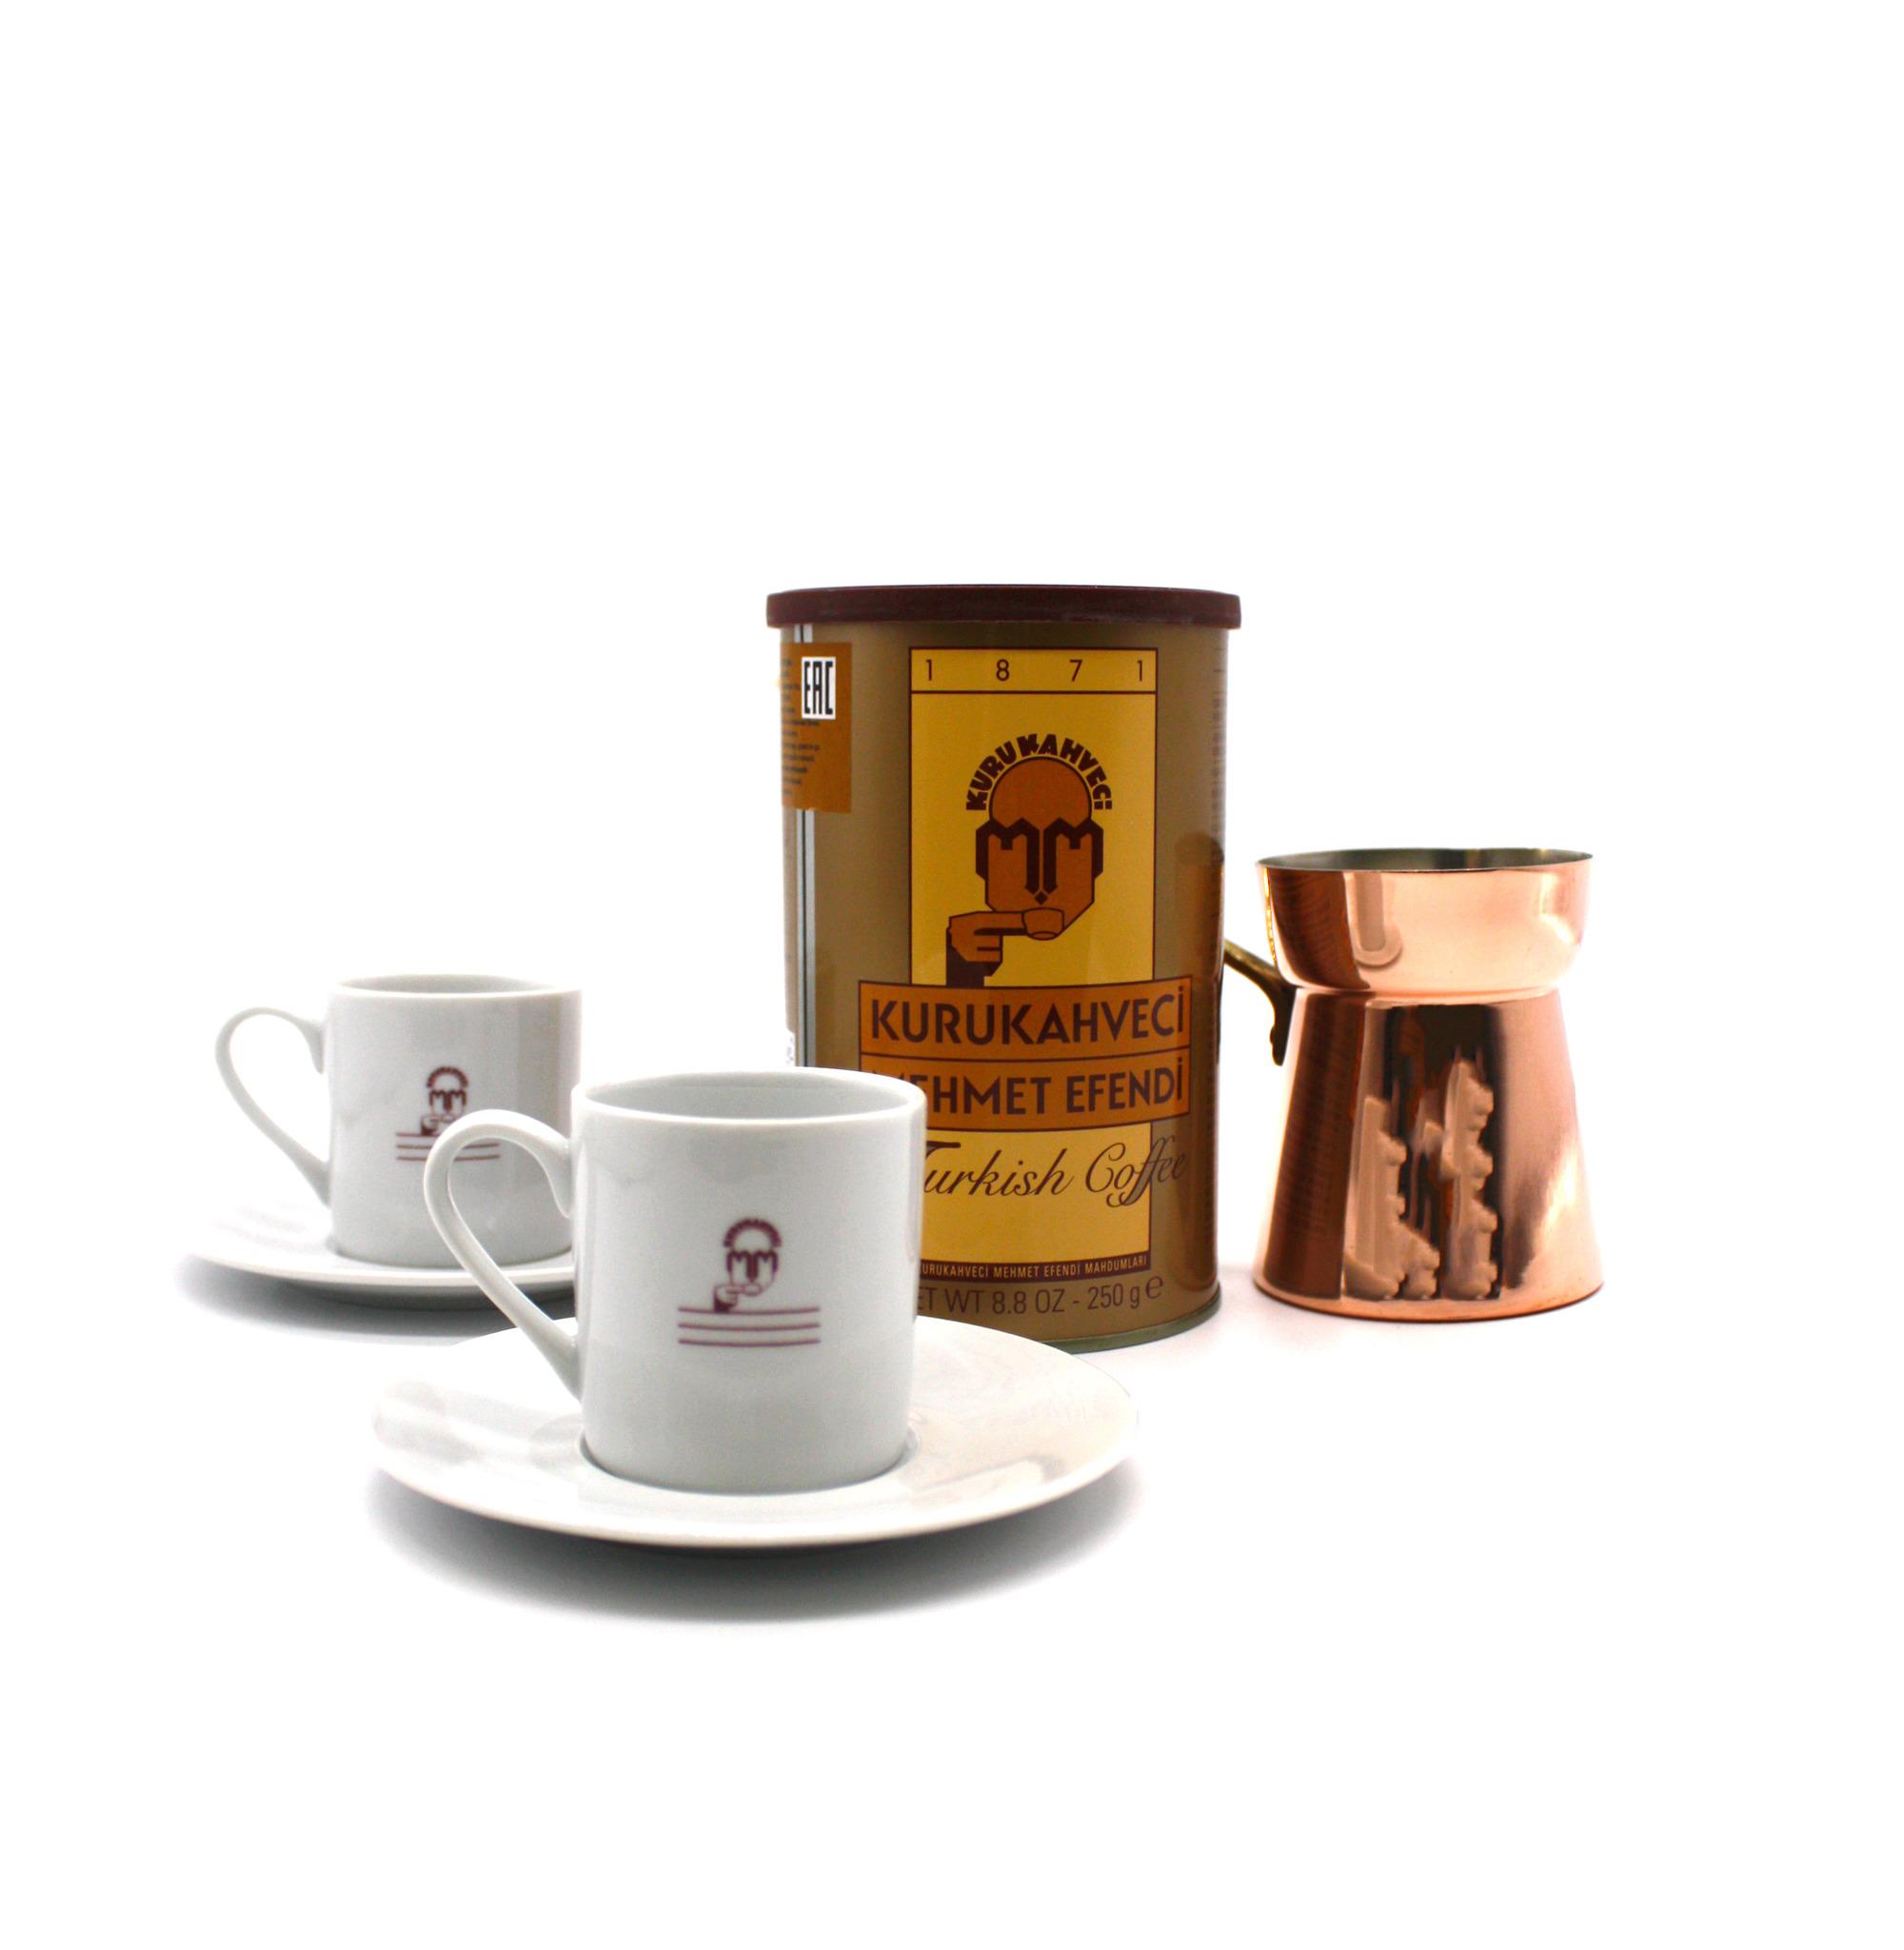 Mehmet Efendi Подарочный набор Mehmet Efendi (кофе молотый 250 г, турка и чашки) import_files_e8_e856e507c61511e8a99c484d7ecee297_e856e526c61511e8a99c484d7ecee297.jpg